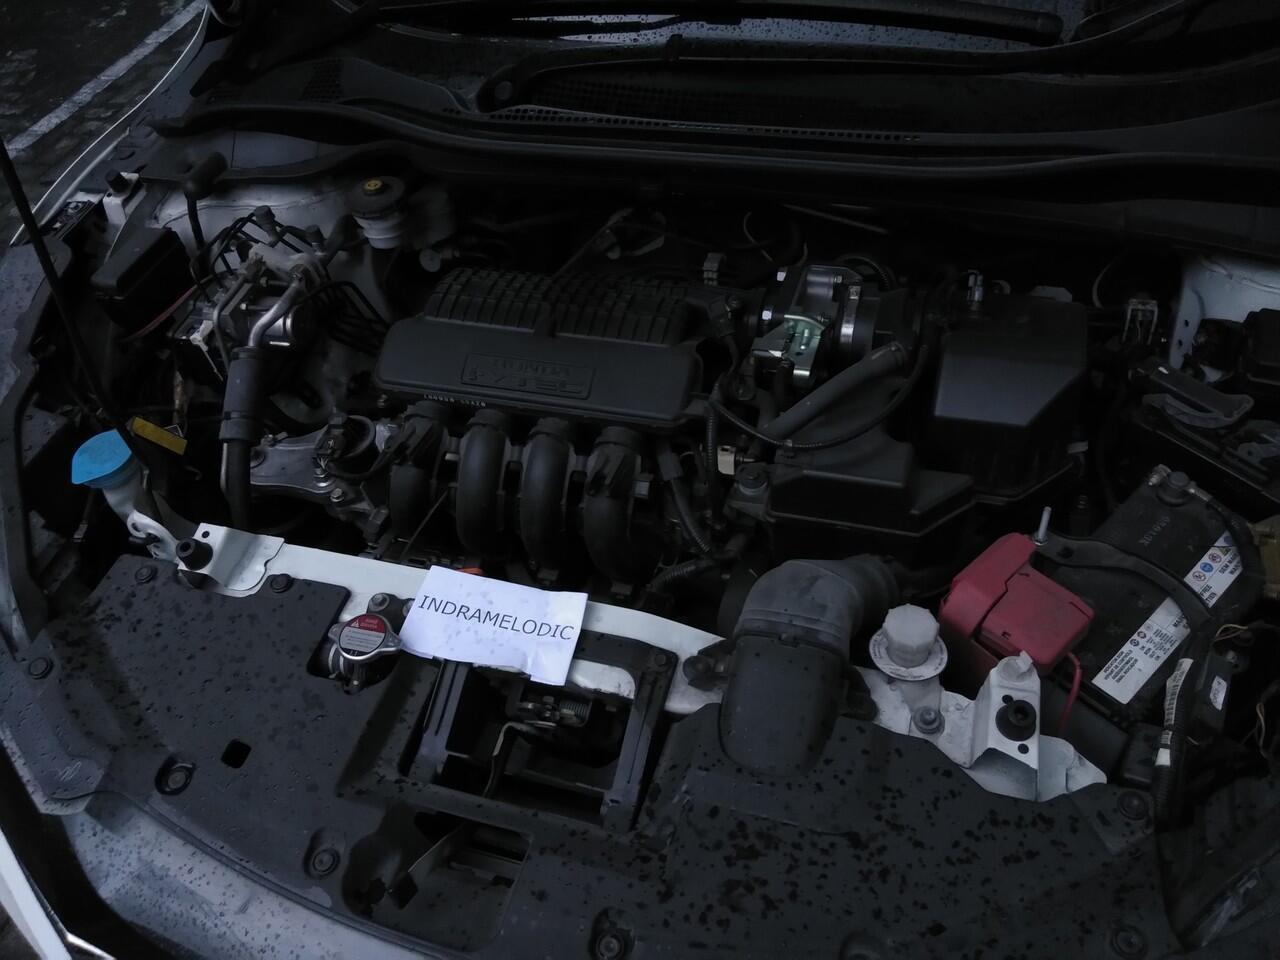 Honda HRV, Biarpun Mobil Kelas Menengah Tapi Terkesan Mewah